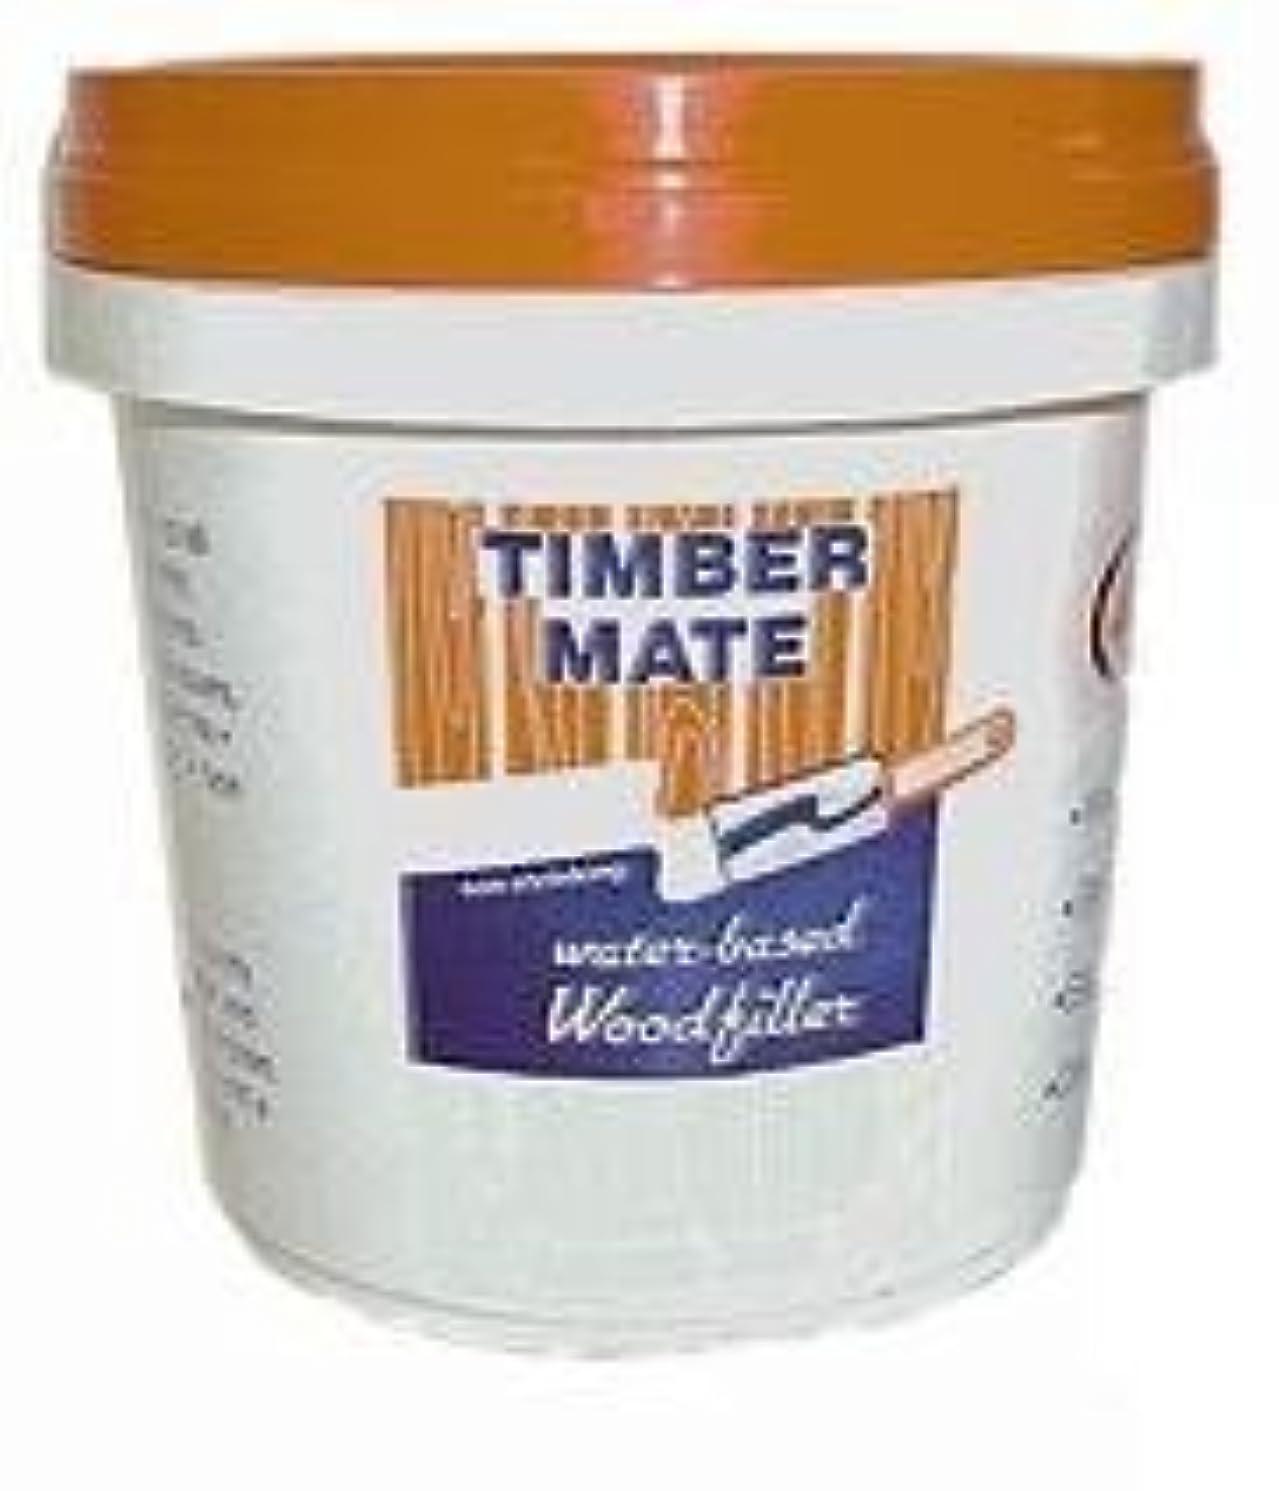 Timber Mate Wood Filler, White Oak, 1 Quart